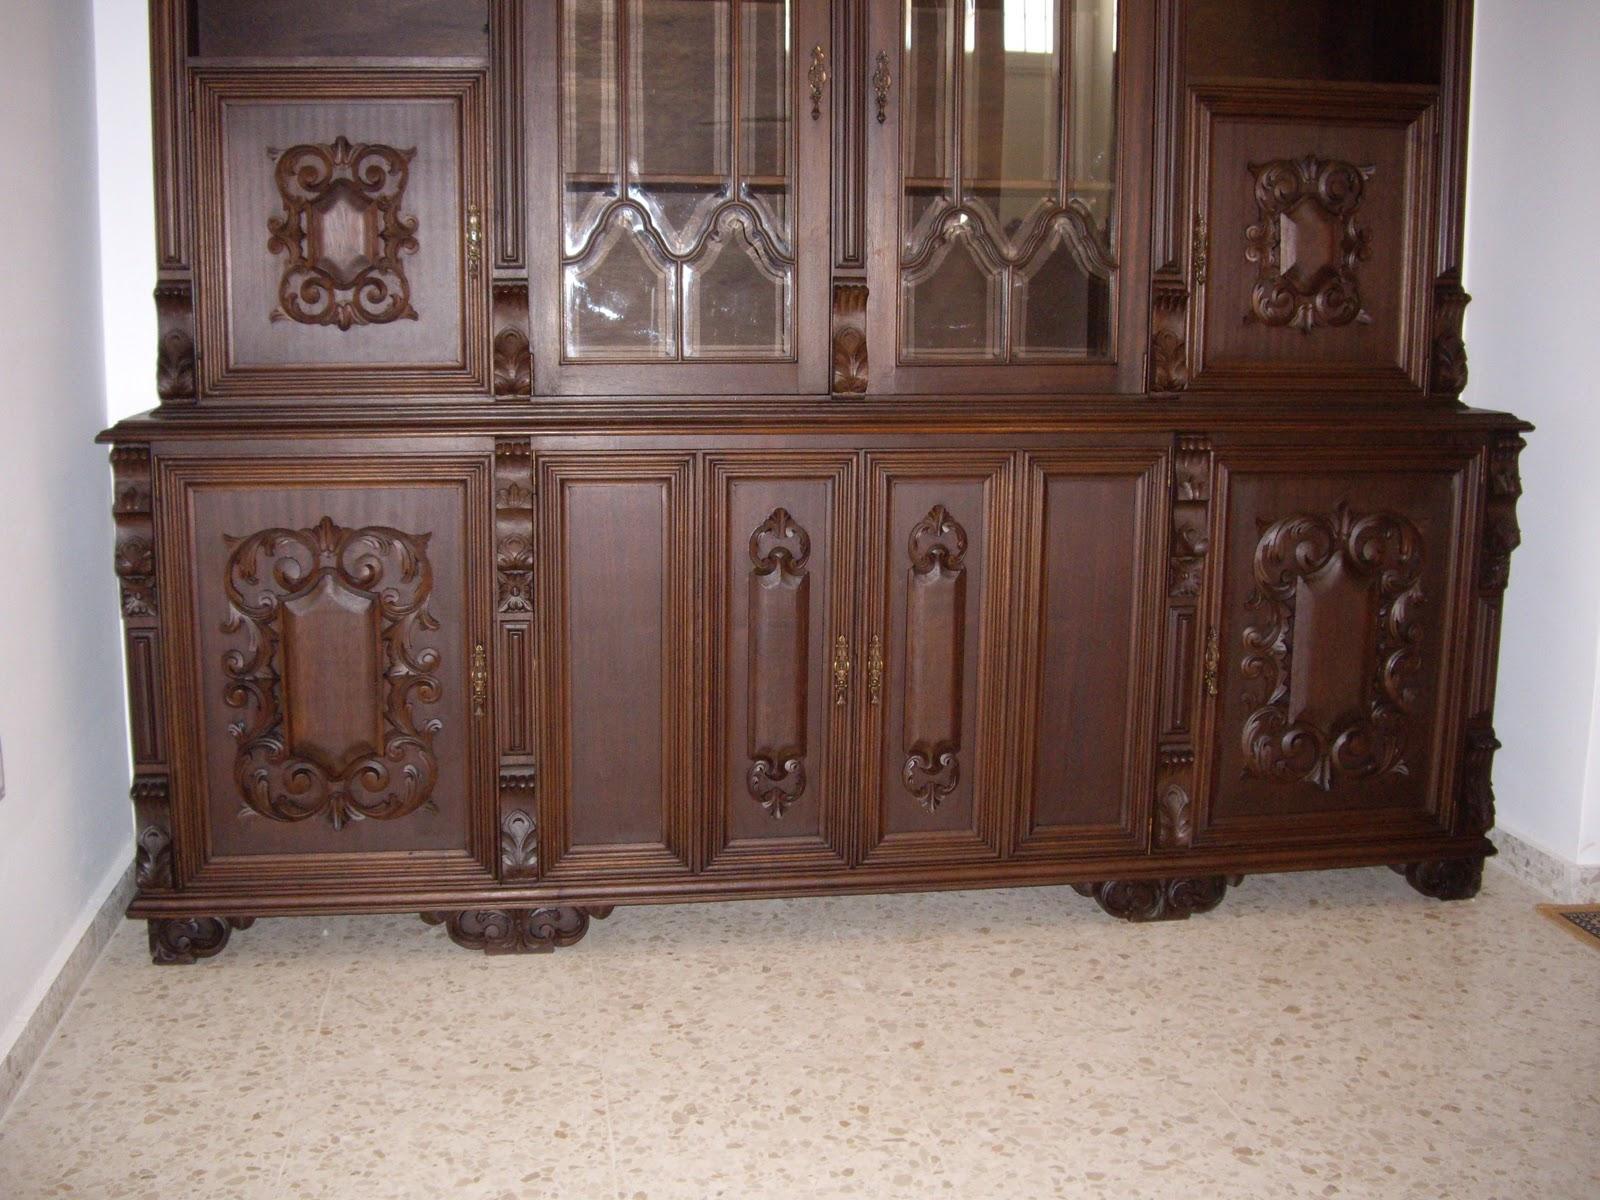 Muebles en crudo en sevilla best catlogo with muebles en crudo en sevilla with muebles en crudo - Muebles en crudo sevilla ...